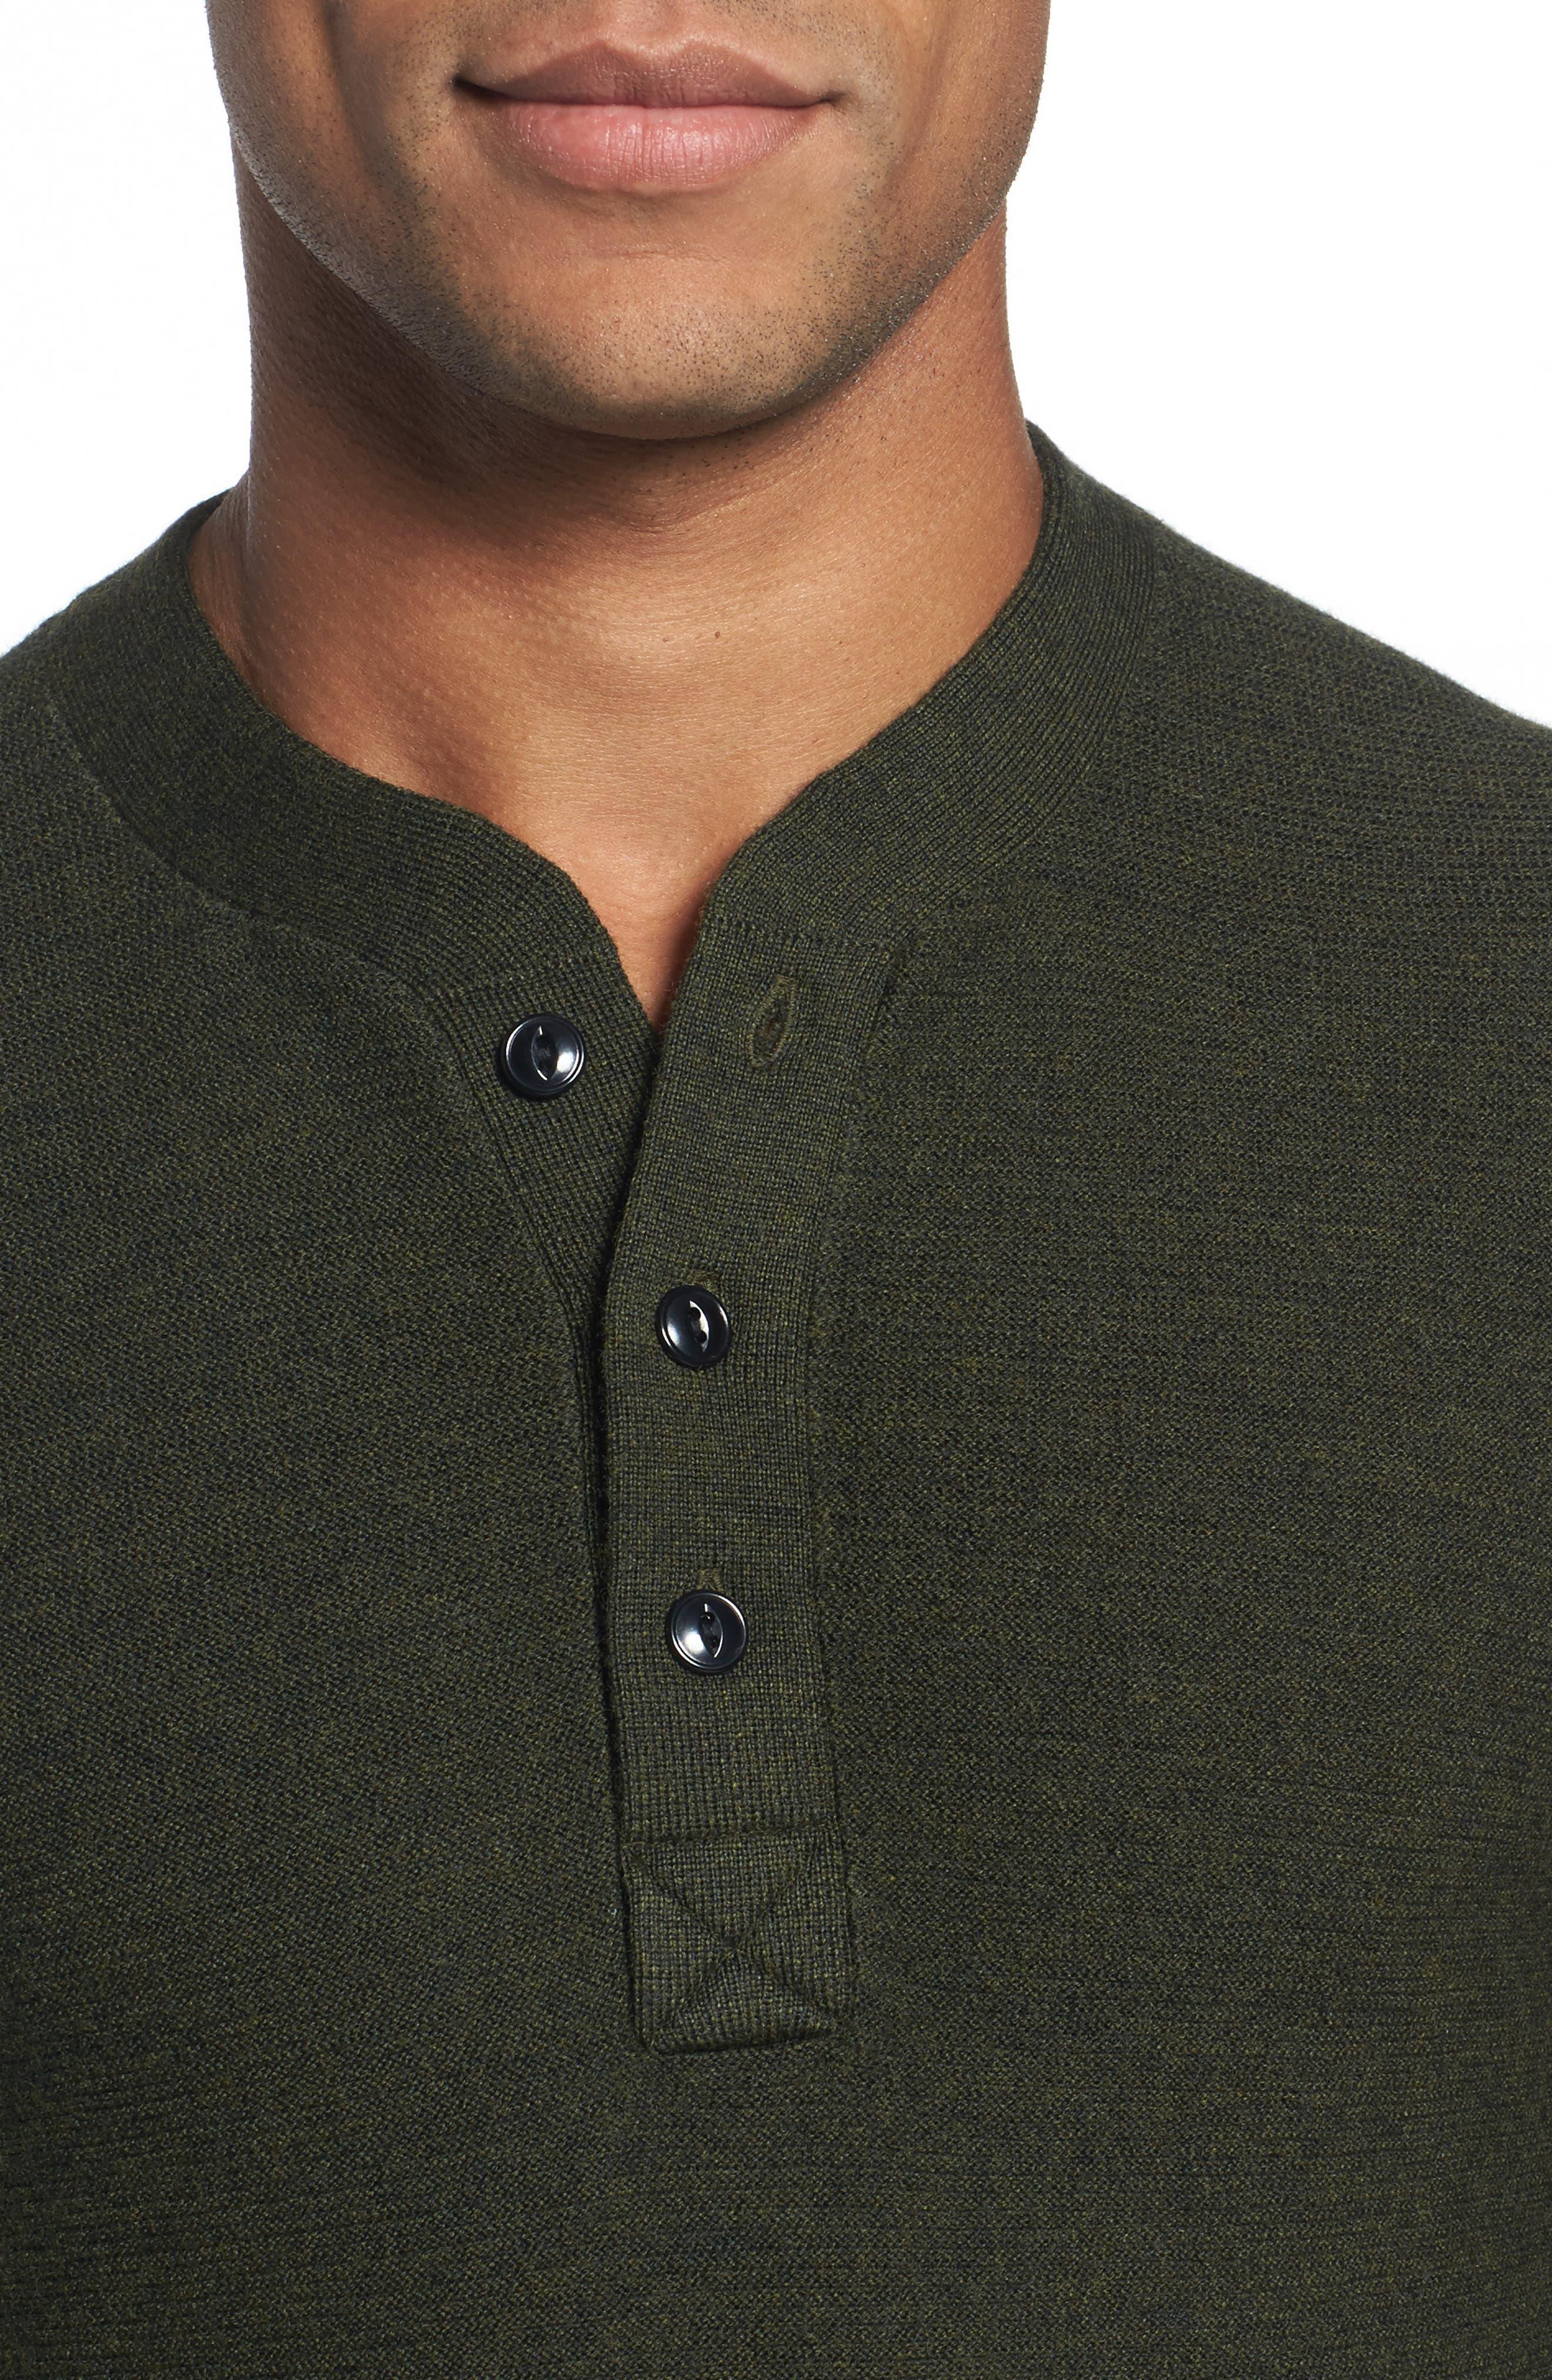 Slim Fit Merino Long Sleeve Henley Sweater,                             Alternate thumbnail 4, color,                             300